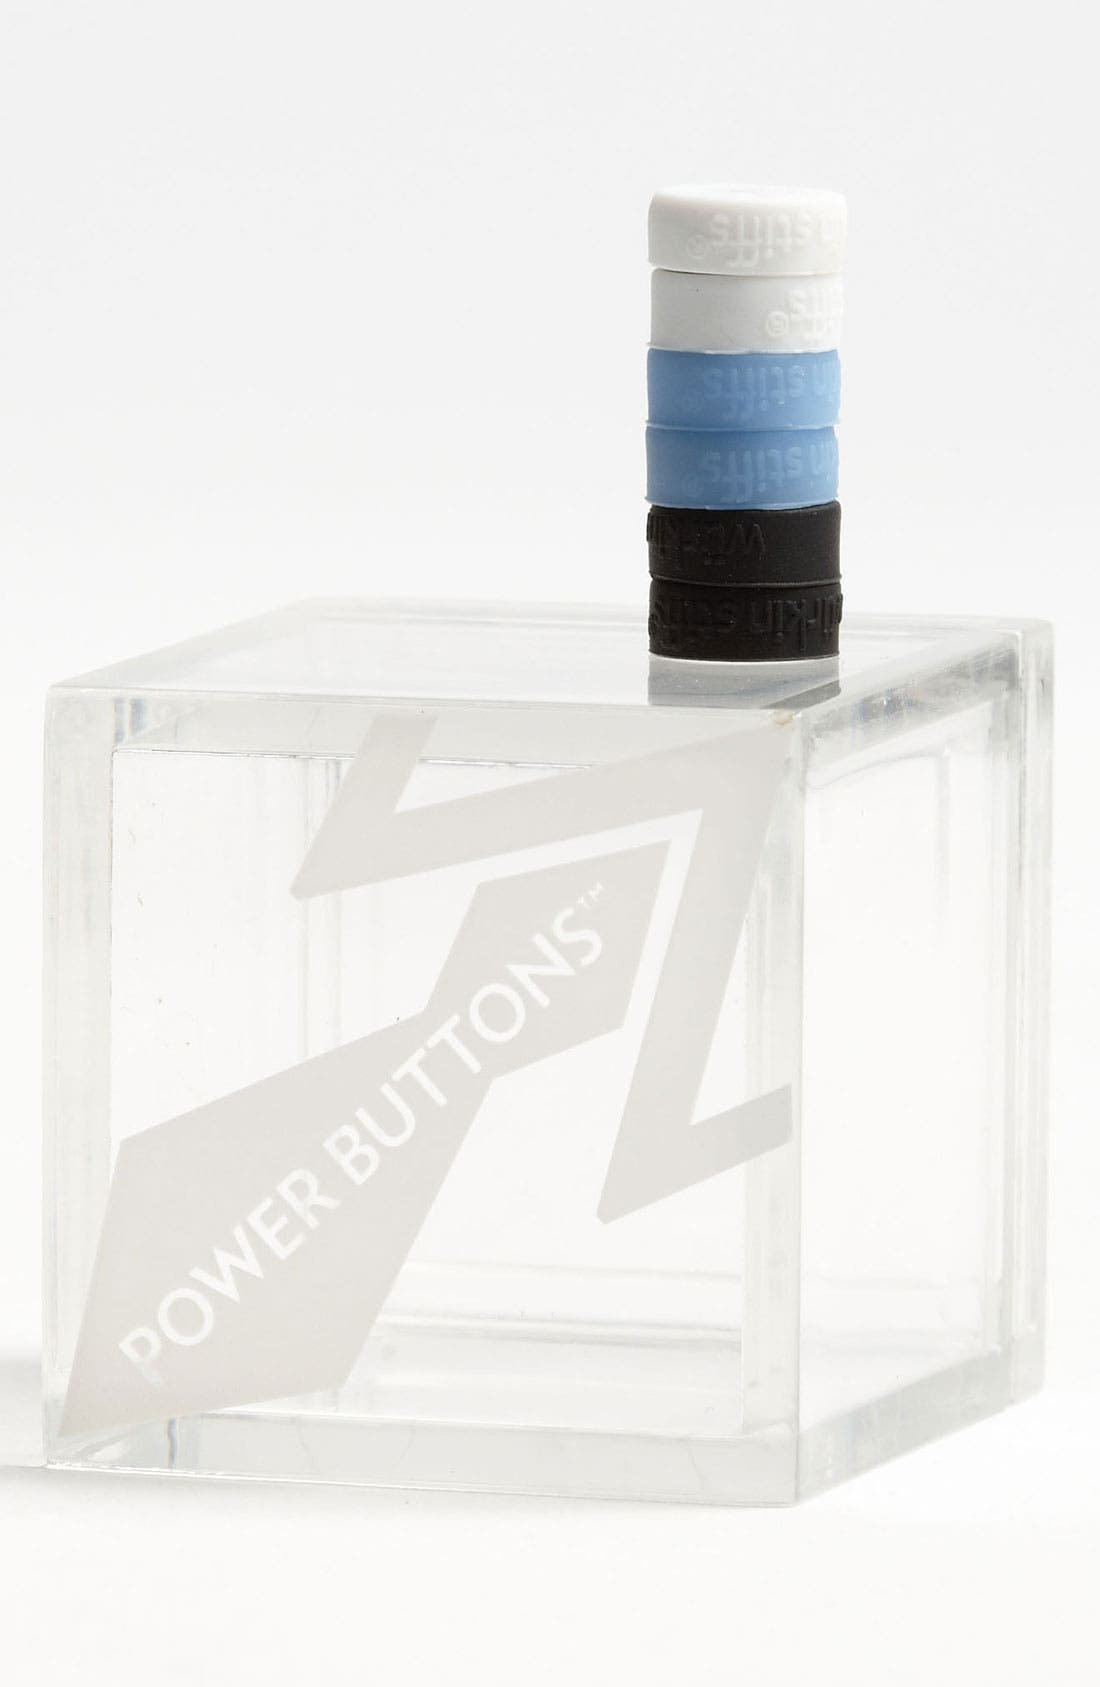 Main Image - Würkin Stiffs Power Buttons (Package of 6)